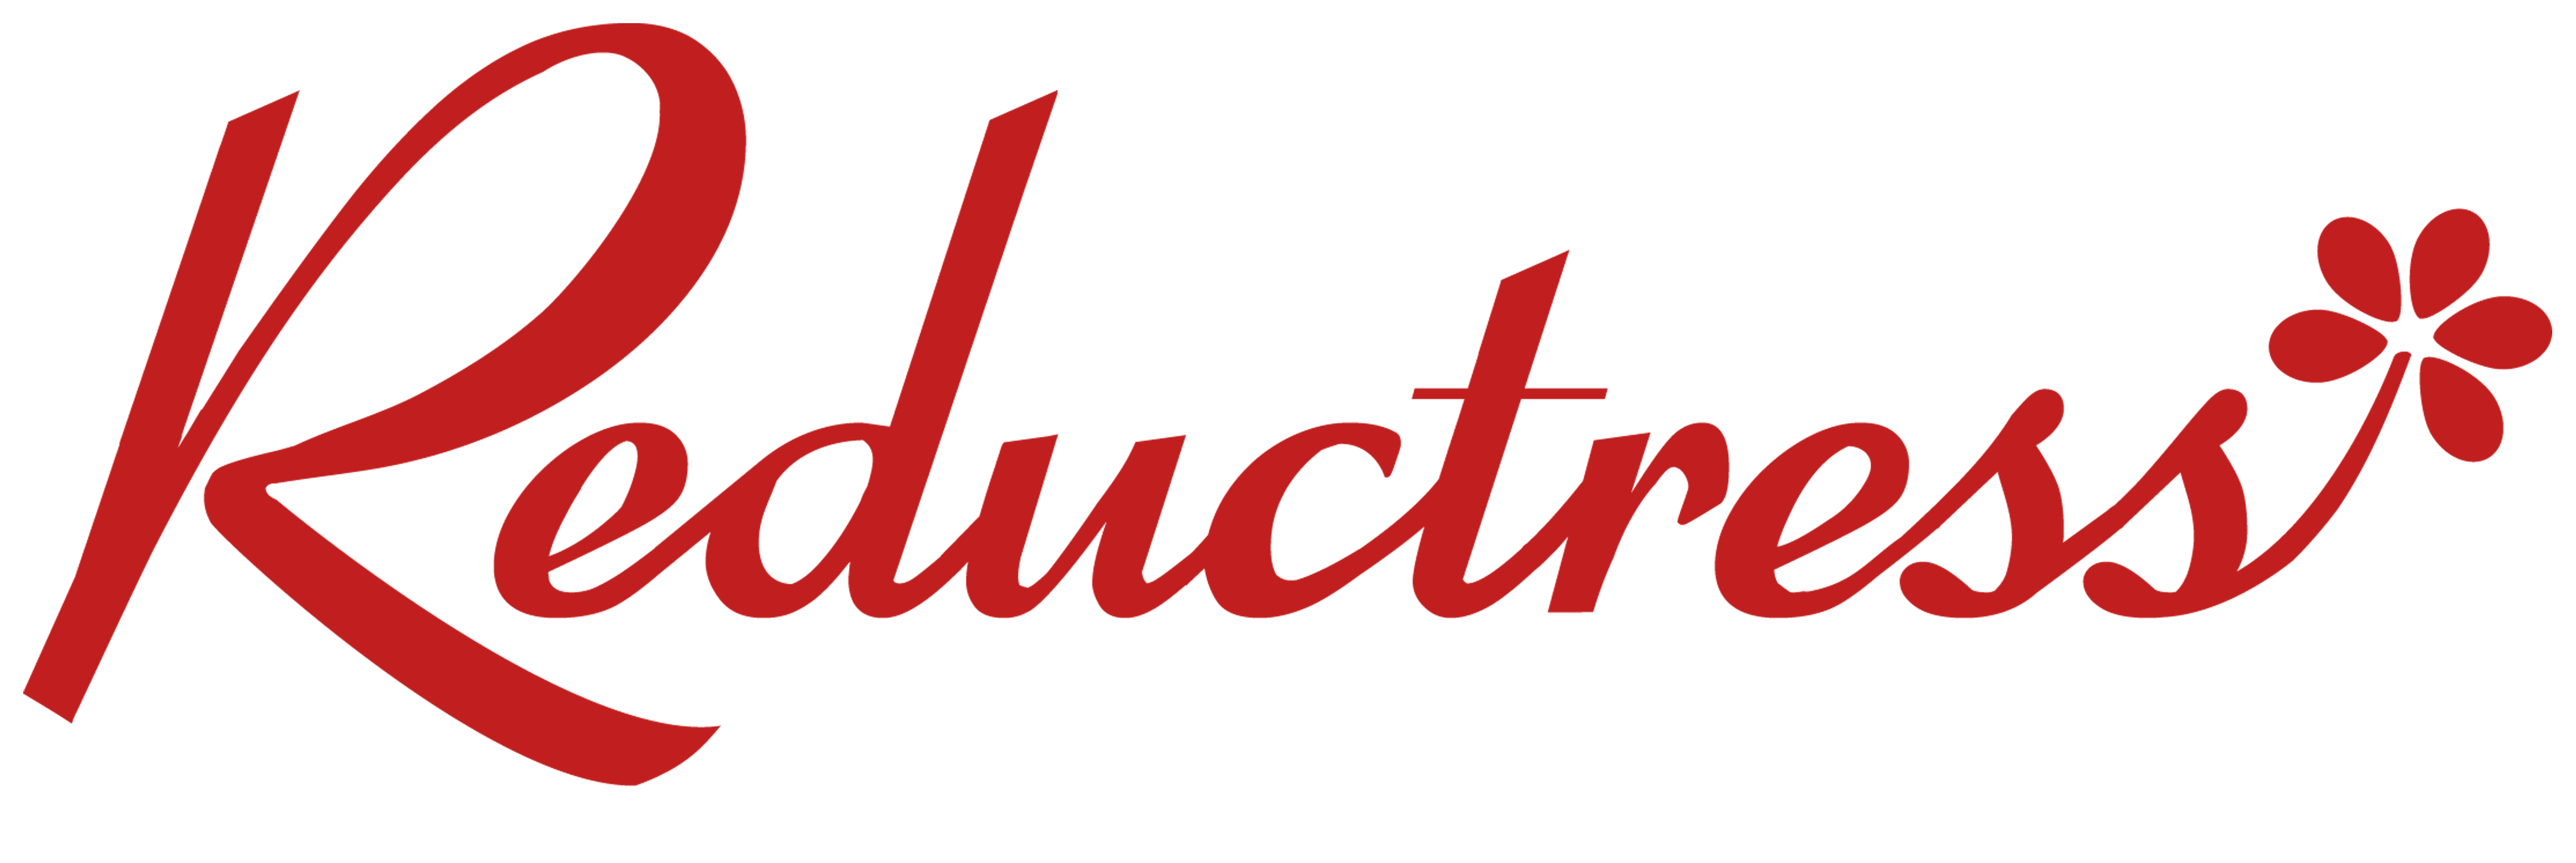 Reductress - Satire